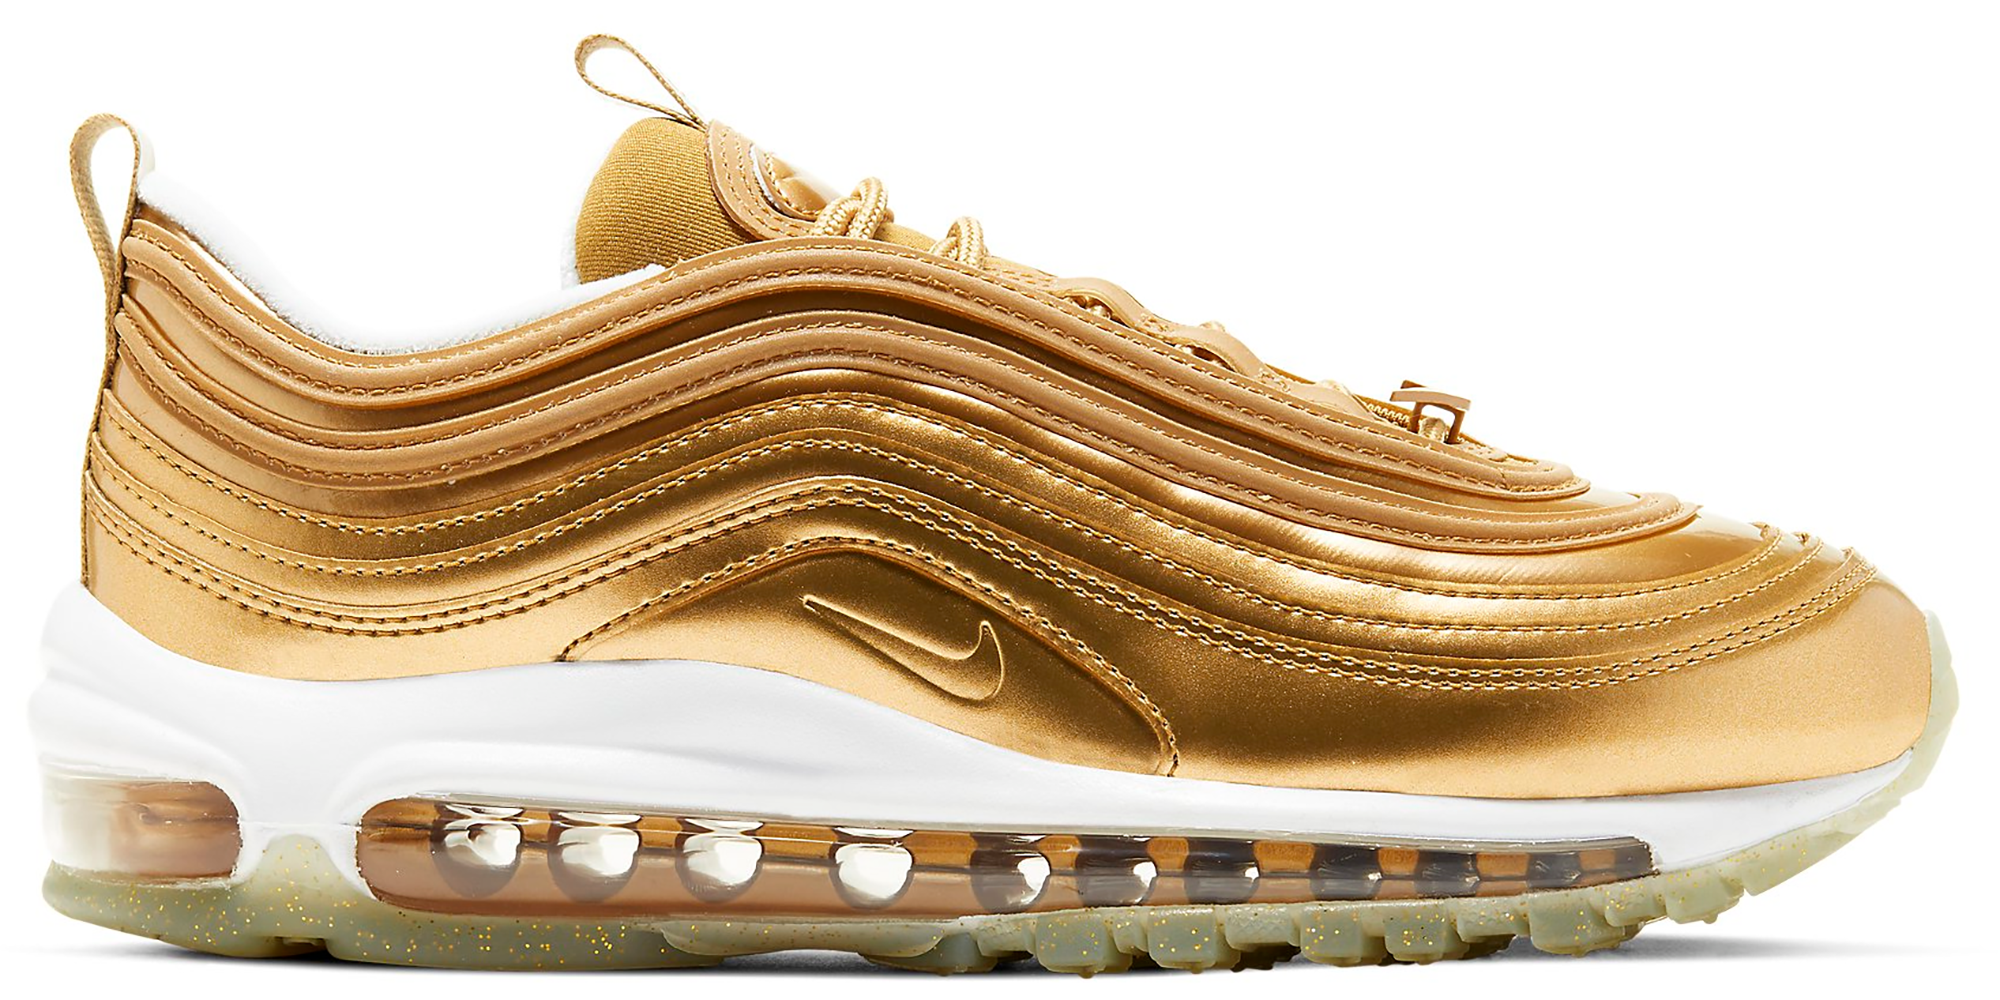 Nike Air Max 97 Gold Medal (2020